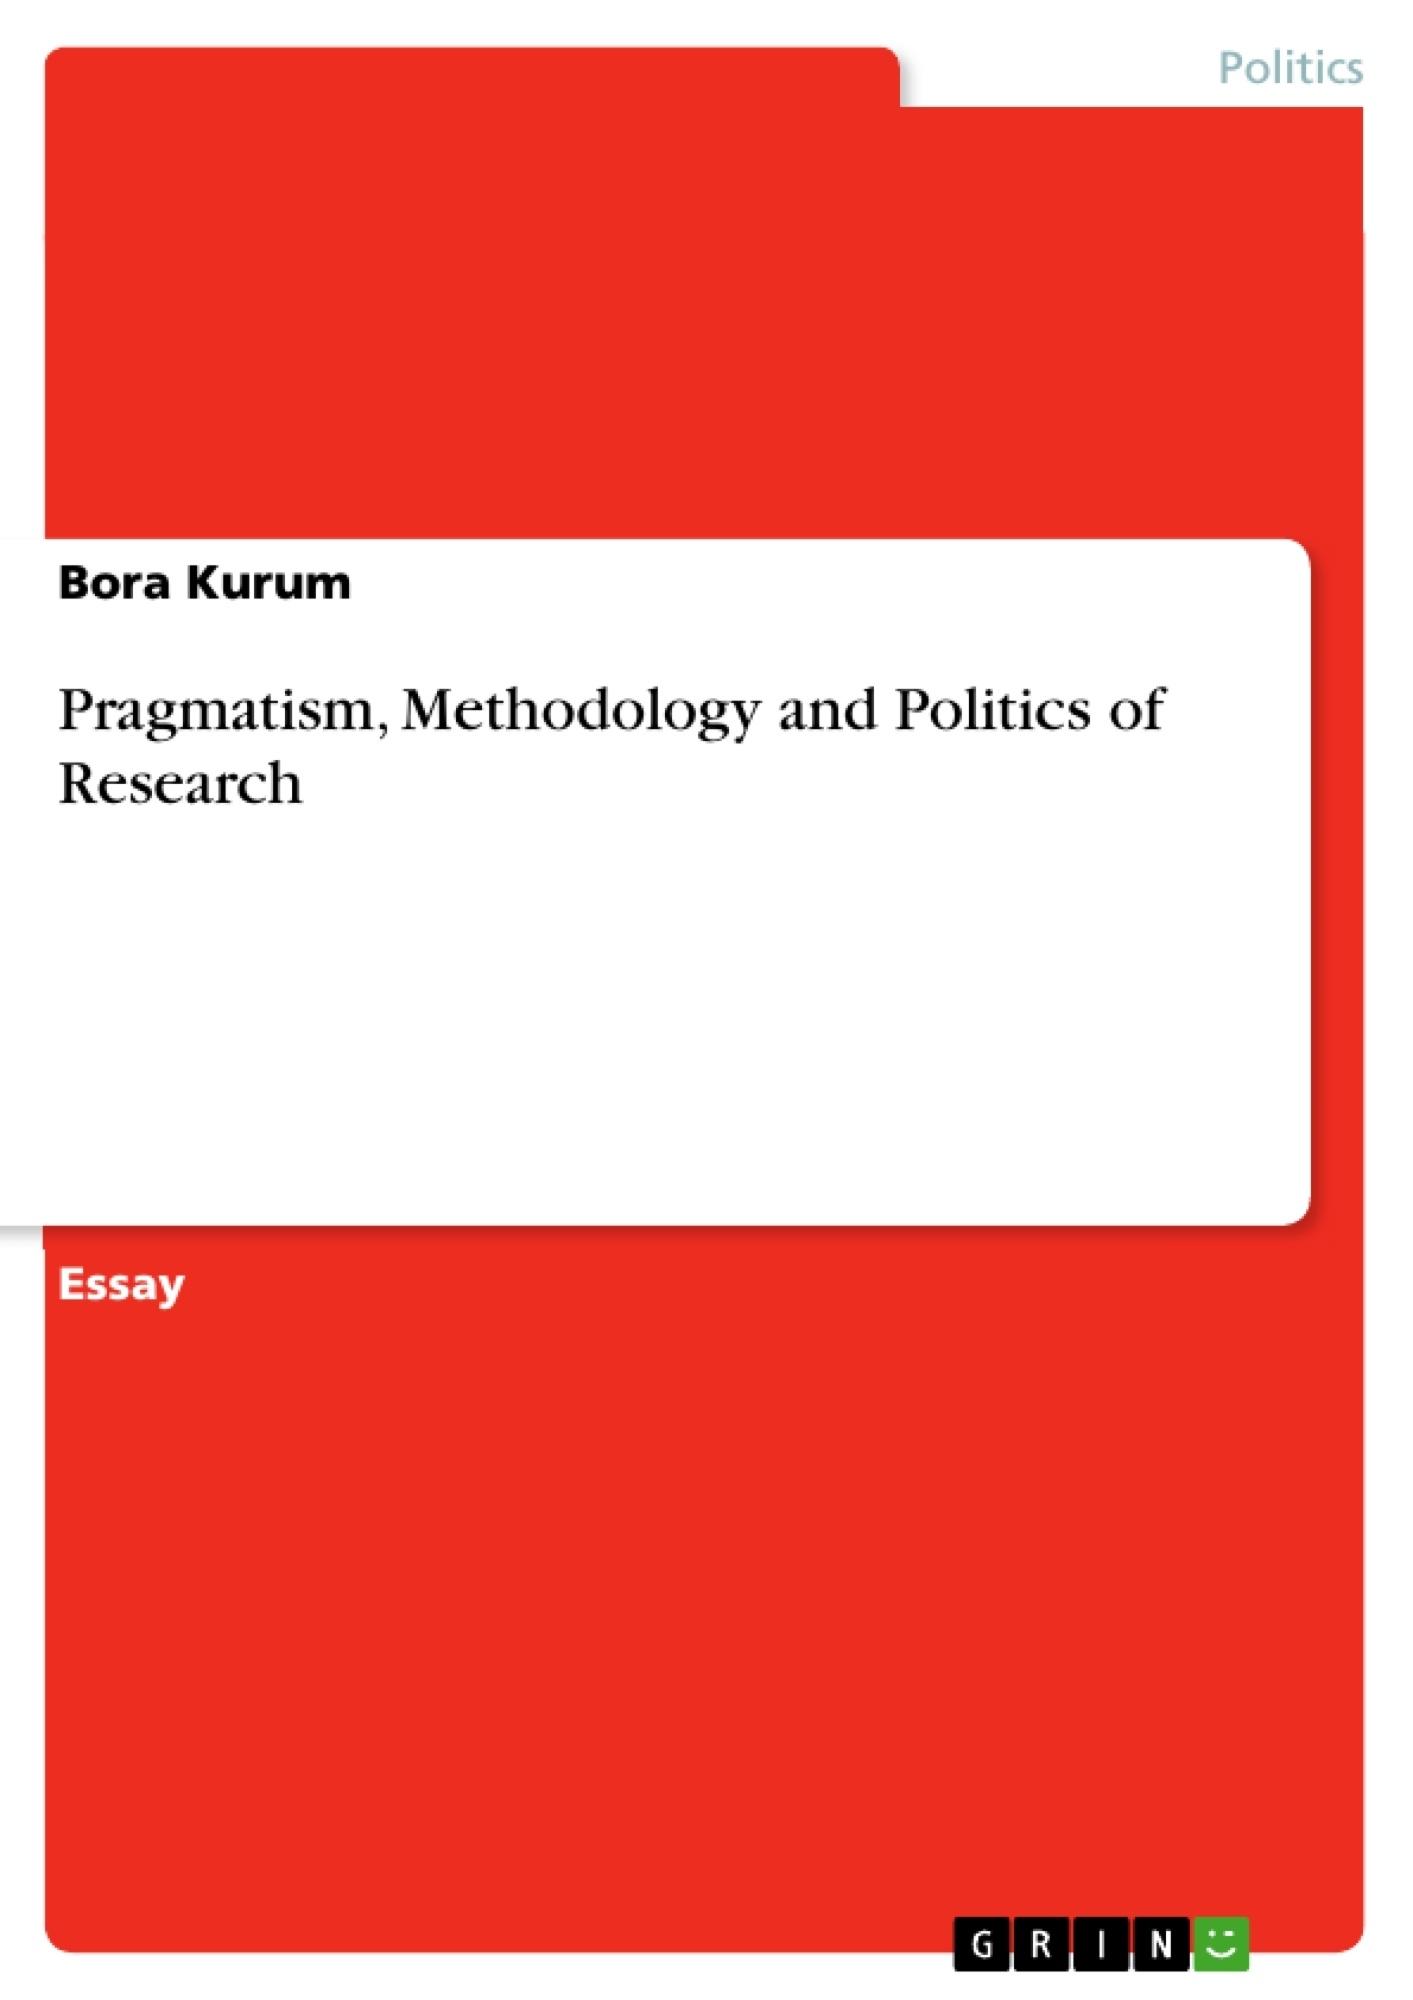 Title: Pragmatism, Methodology and Politics of Research